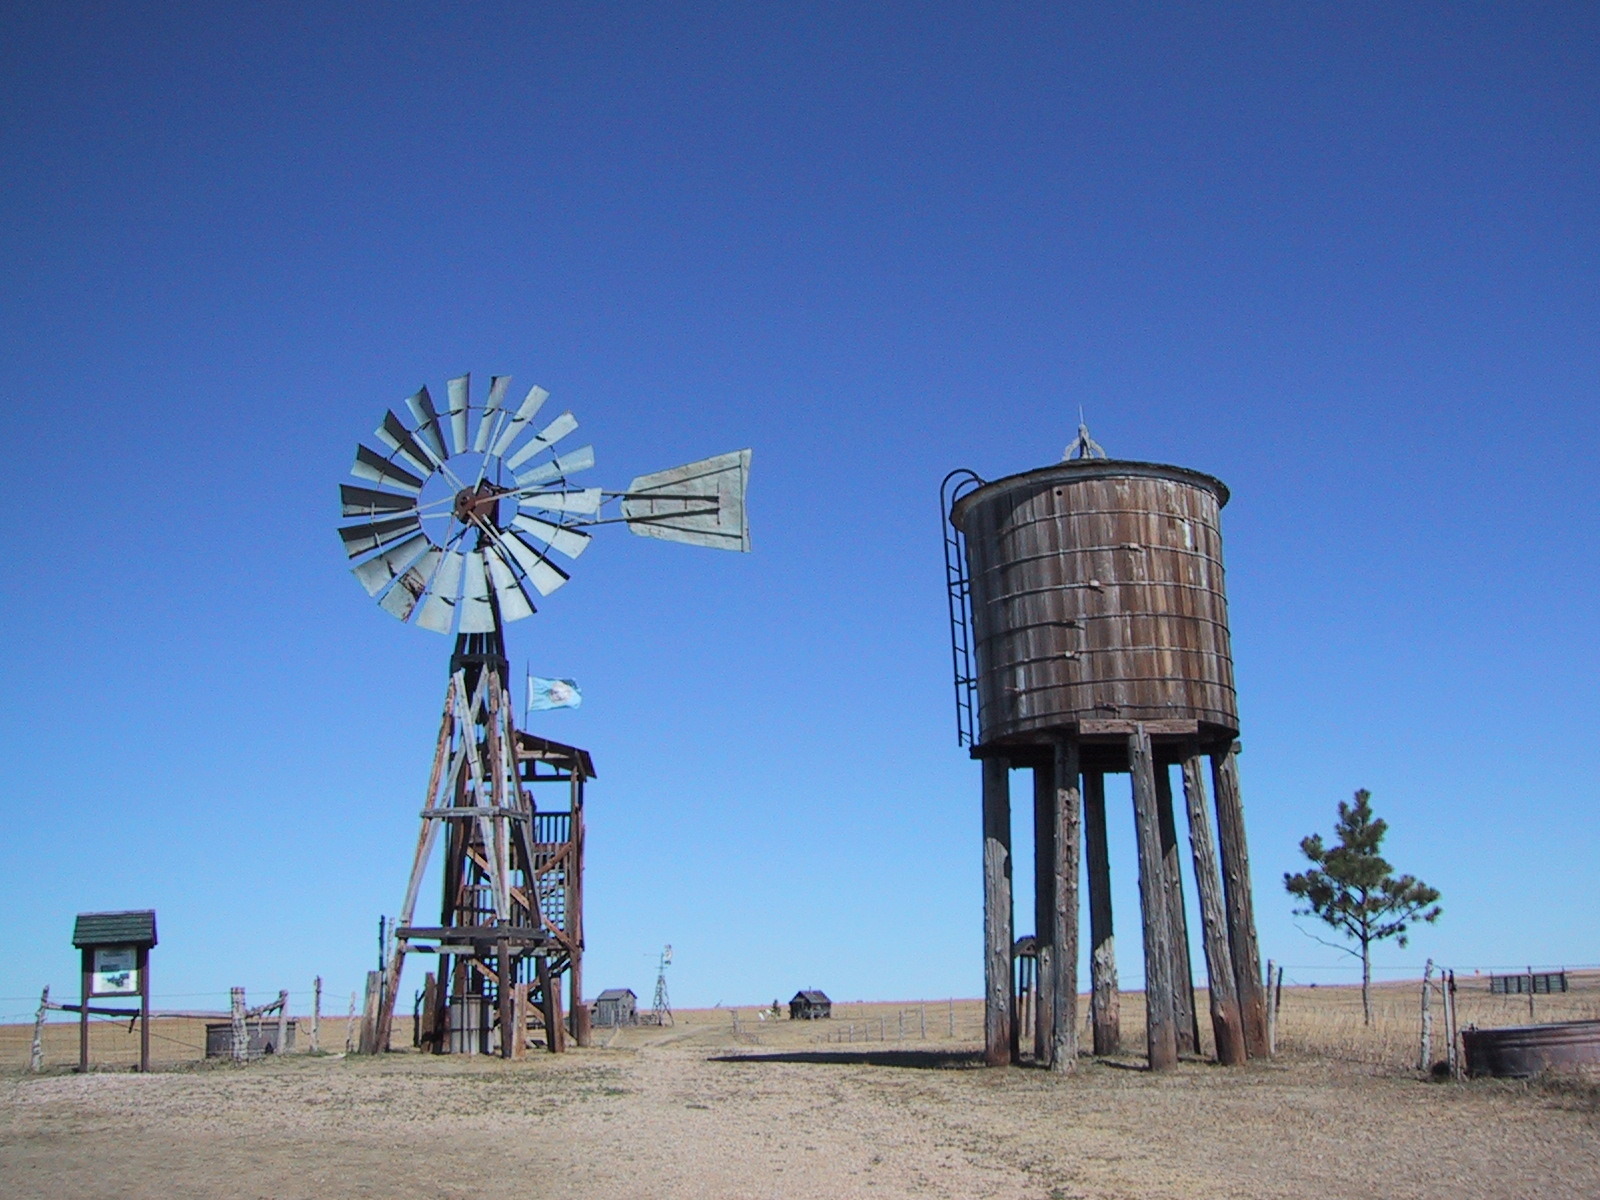 File:Old Windmill.jpg - Wikimedia Commons